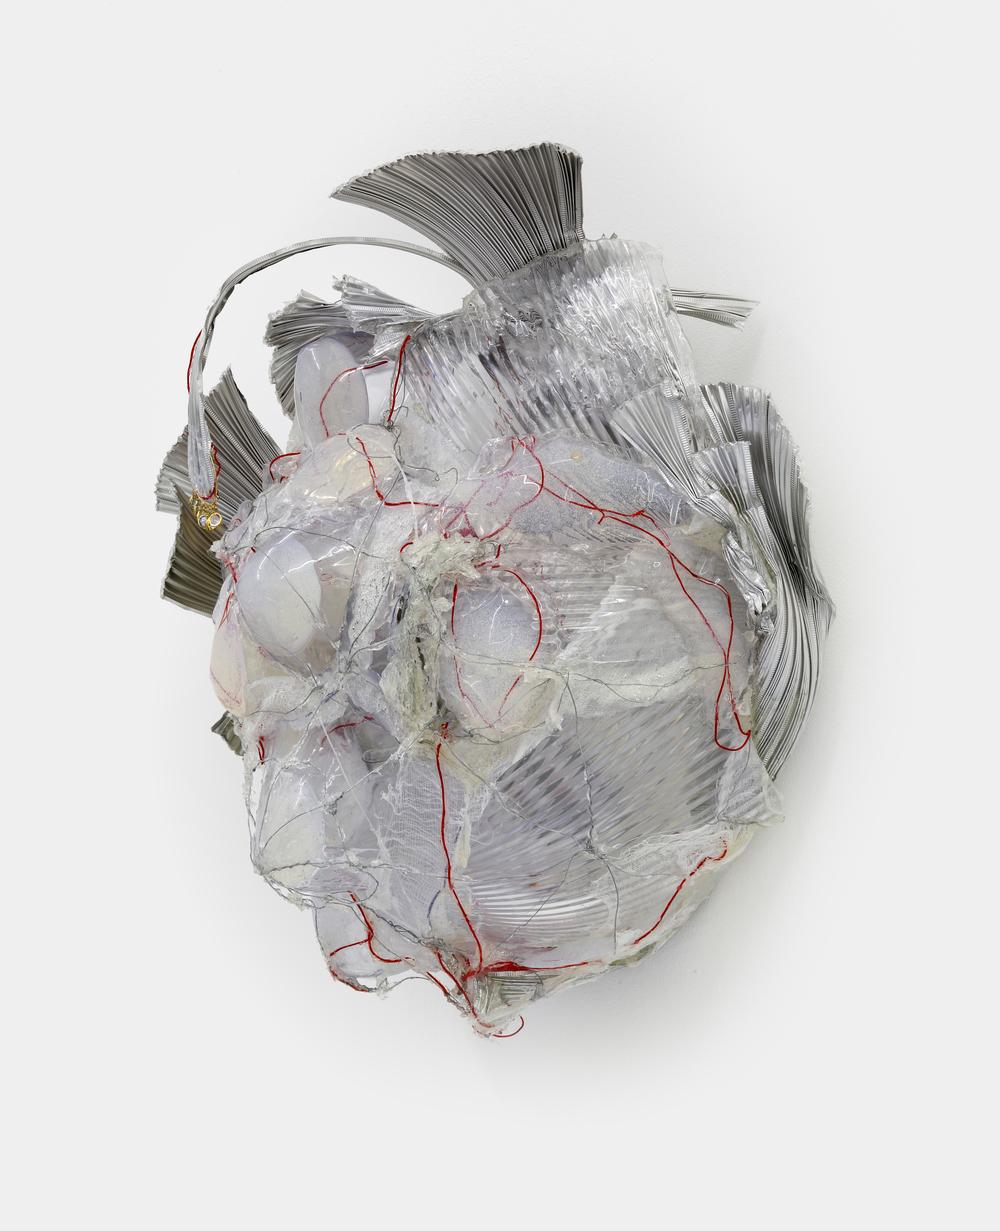 Daiga Grantina,Gefilde der Lust, 2015,Mixed media,70 x 64 x 31 cm,Courtesy Mathew, Berlin, Photo credit Gunter Lepkowski